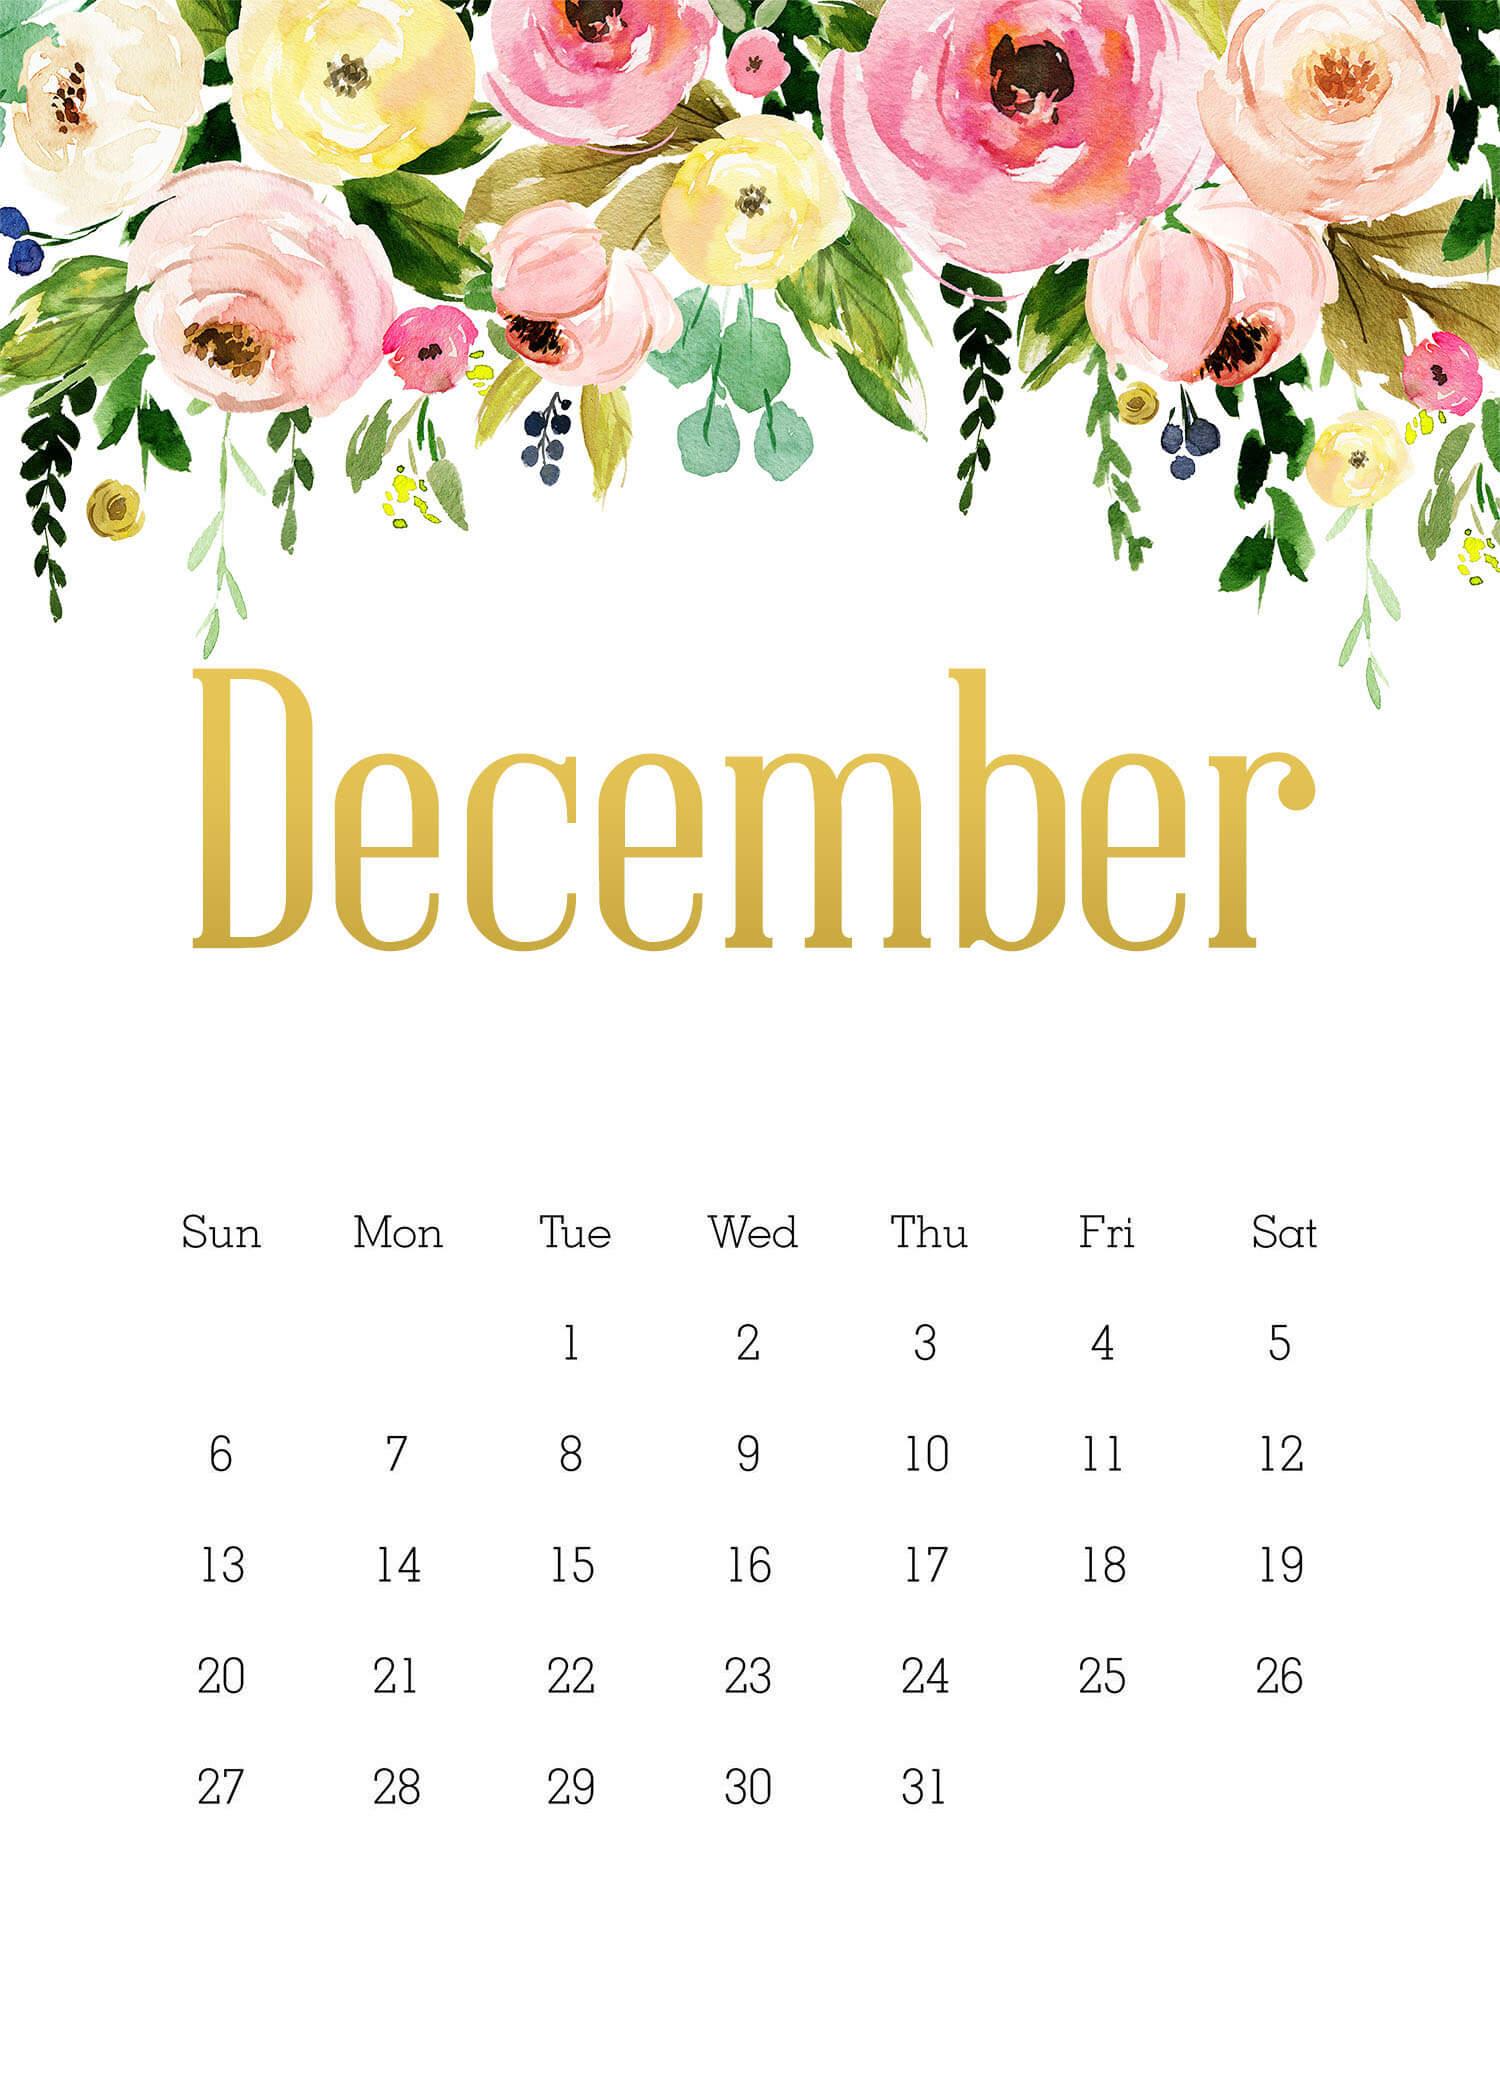 Decorative December 2020 Floral Calendar